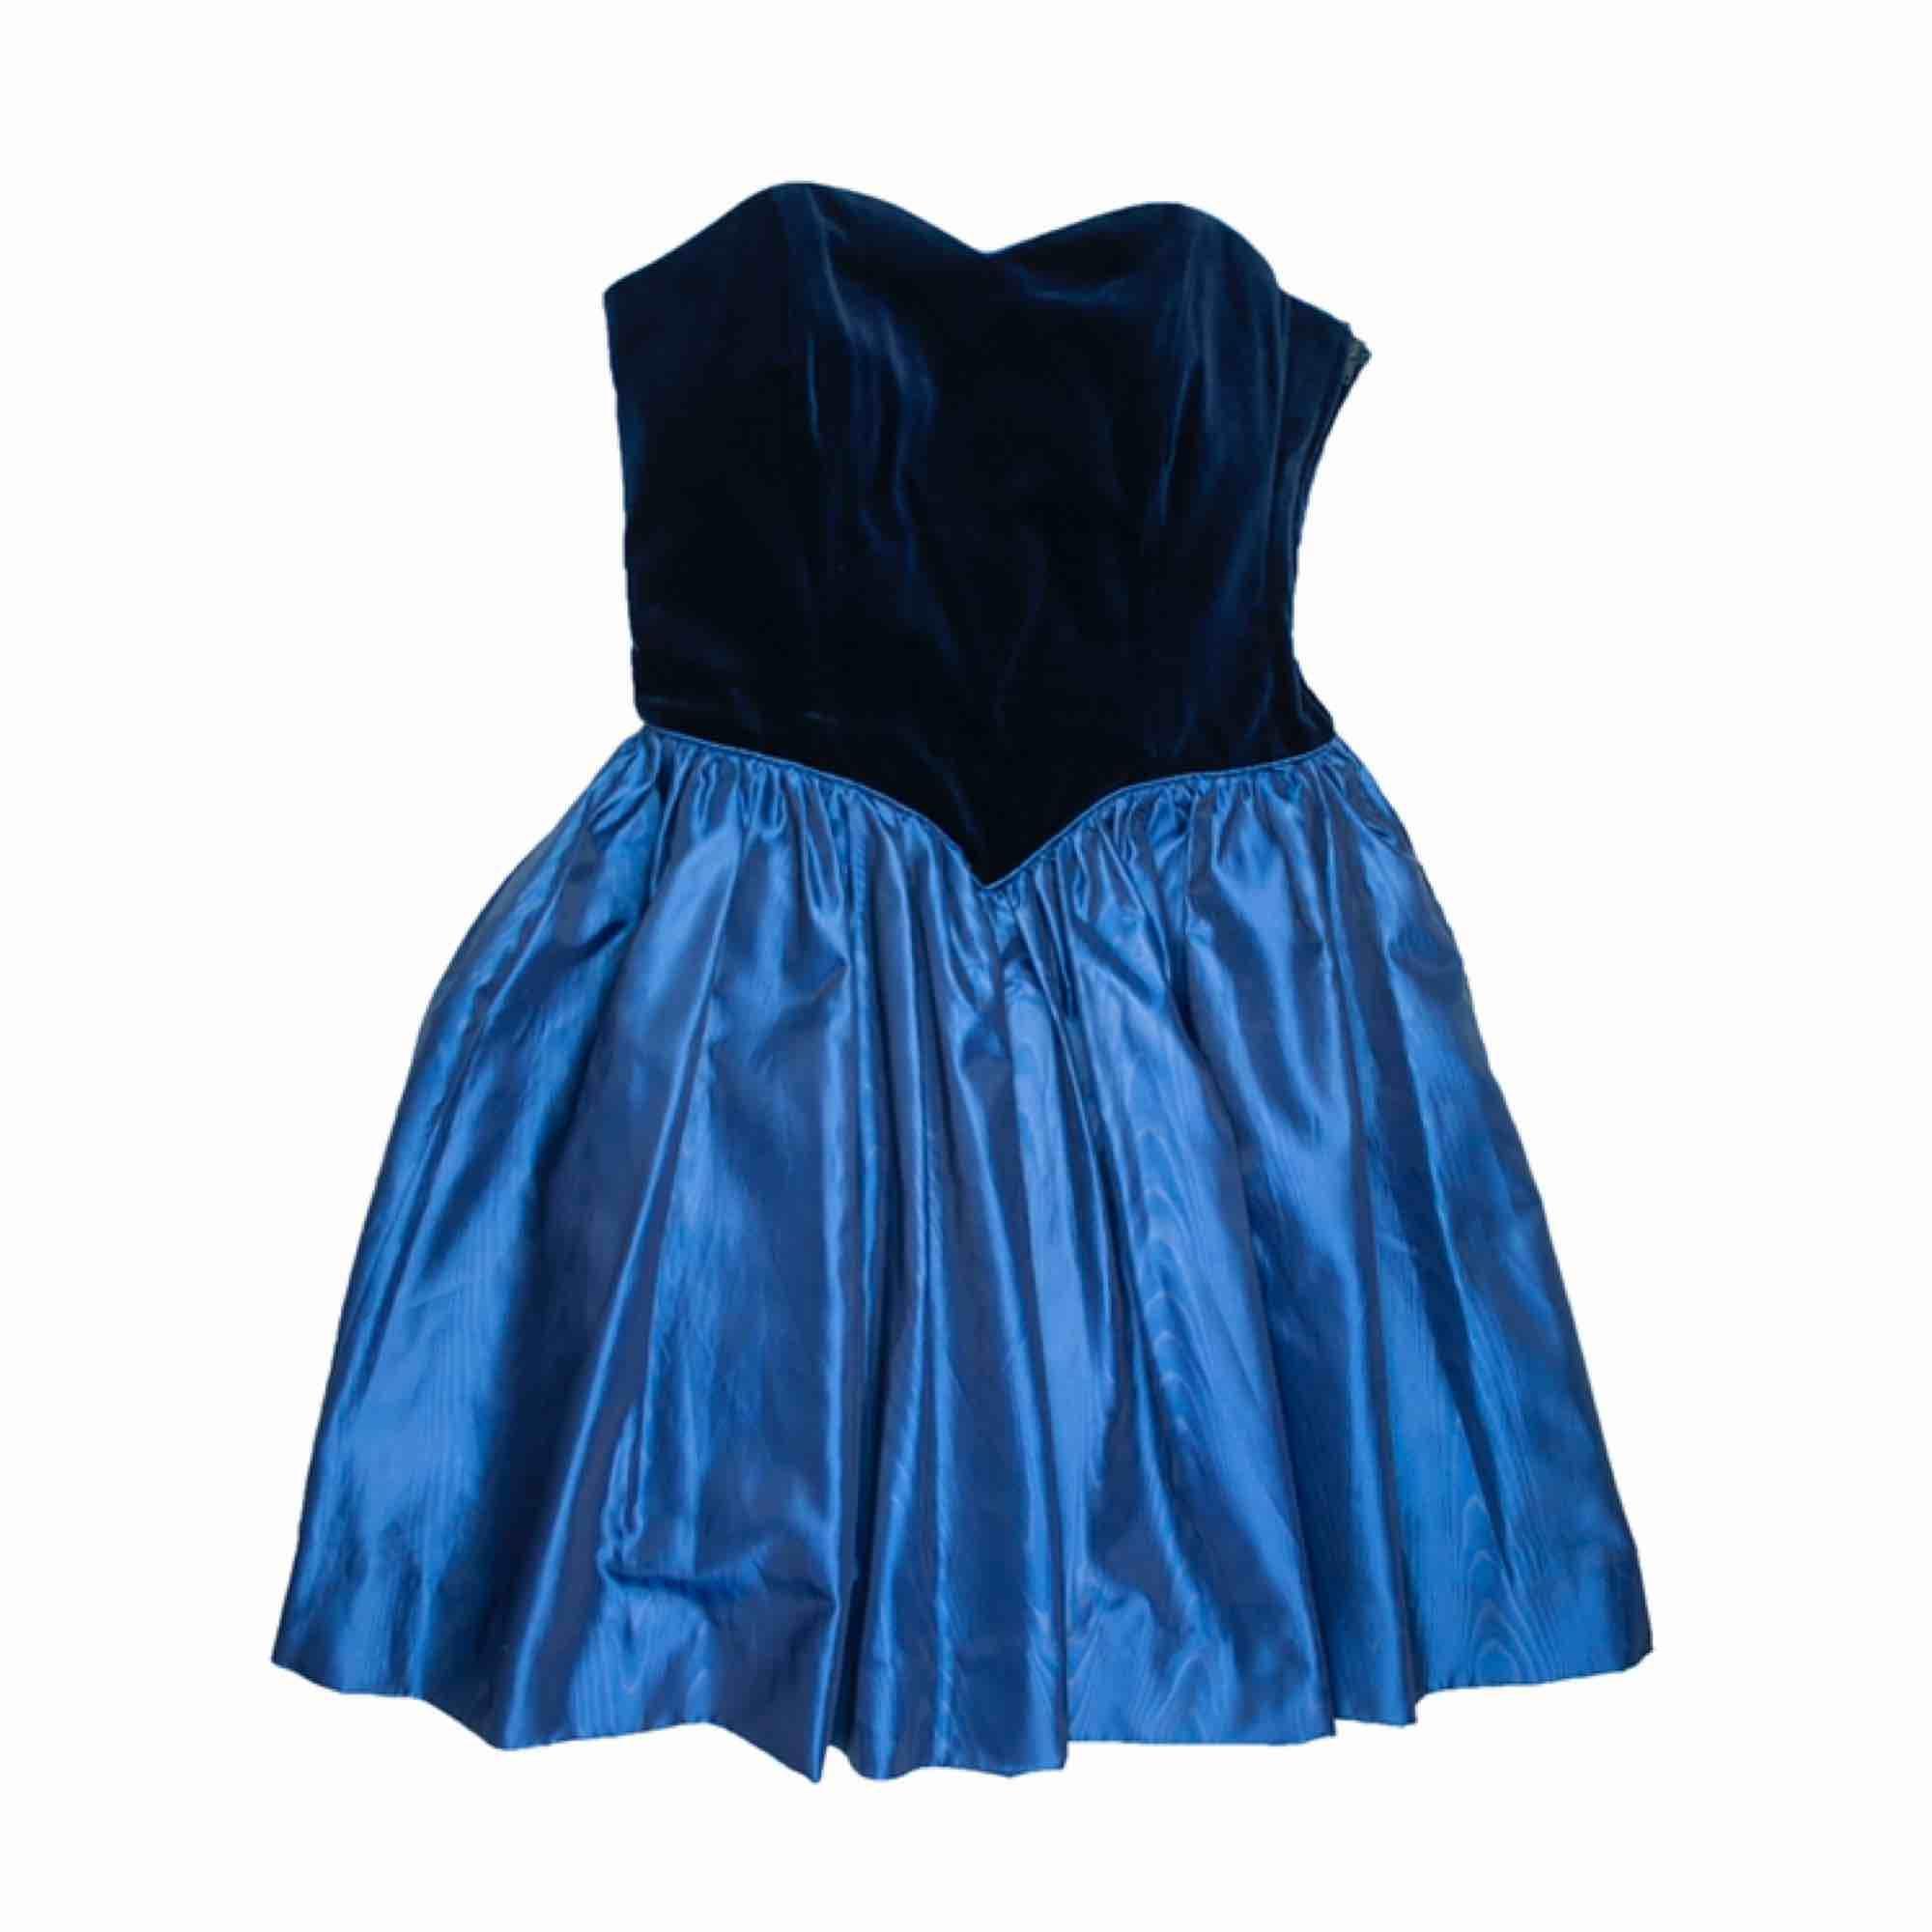 Vintage 80s bustier party dress in blue SIZE Label: EUR 36, fits best XS Model: 165/ XS Measurements (flat):  length: 70 pit to pit: 37 waist: 32 Free shipping! Read the full description at our website majorunit.com No returns. Klänningar.